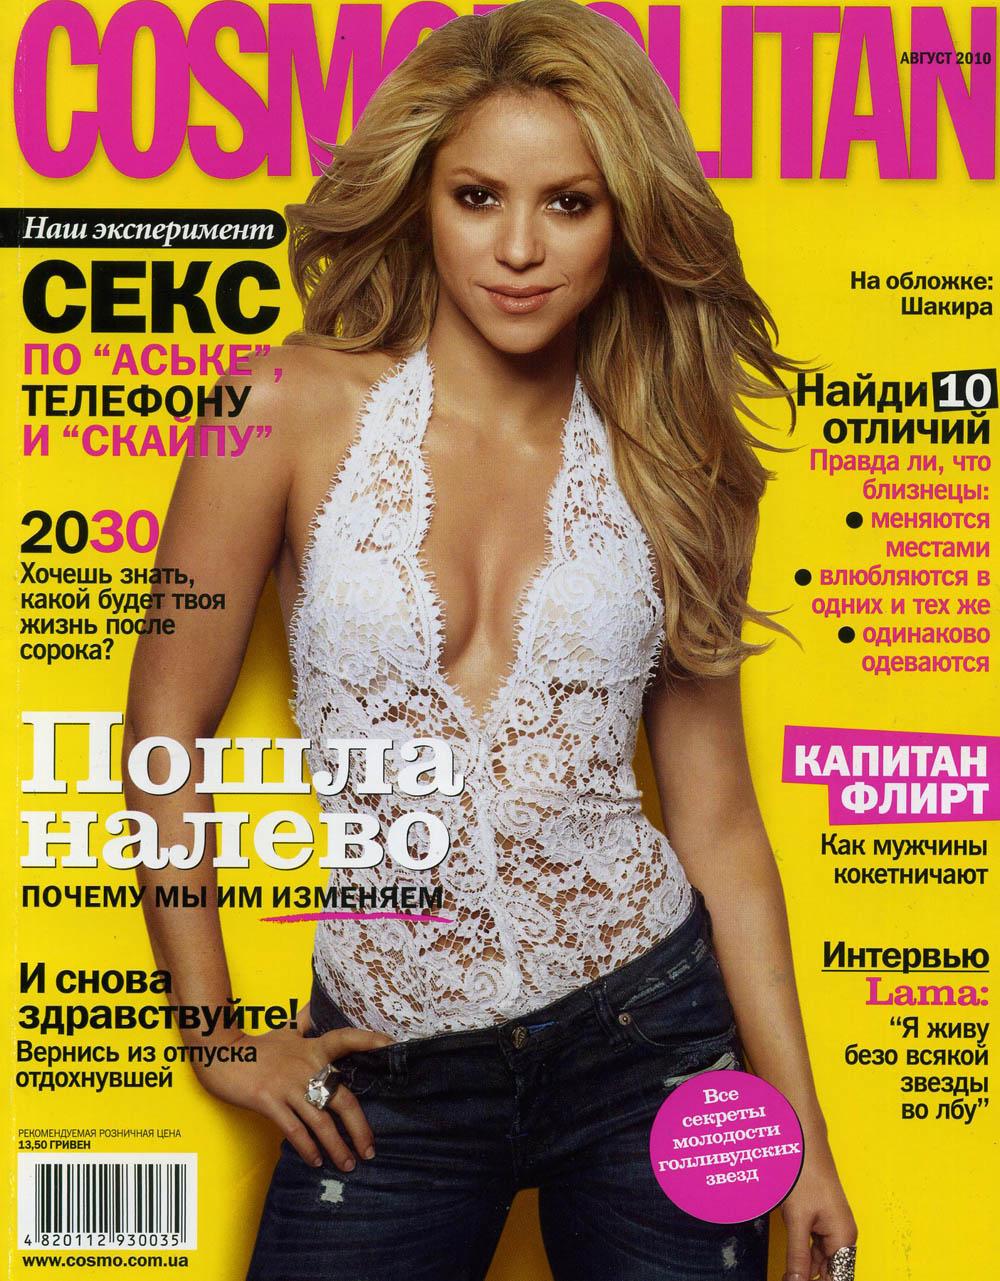 http://www.topcelebs.ru/uploads/posts/2010-09/1285877059_1.jpg